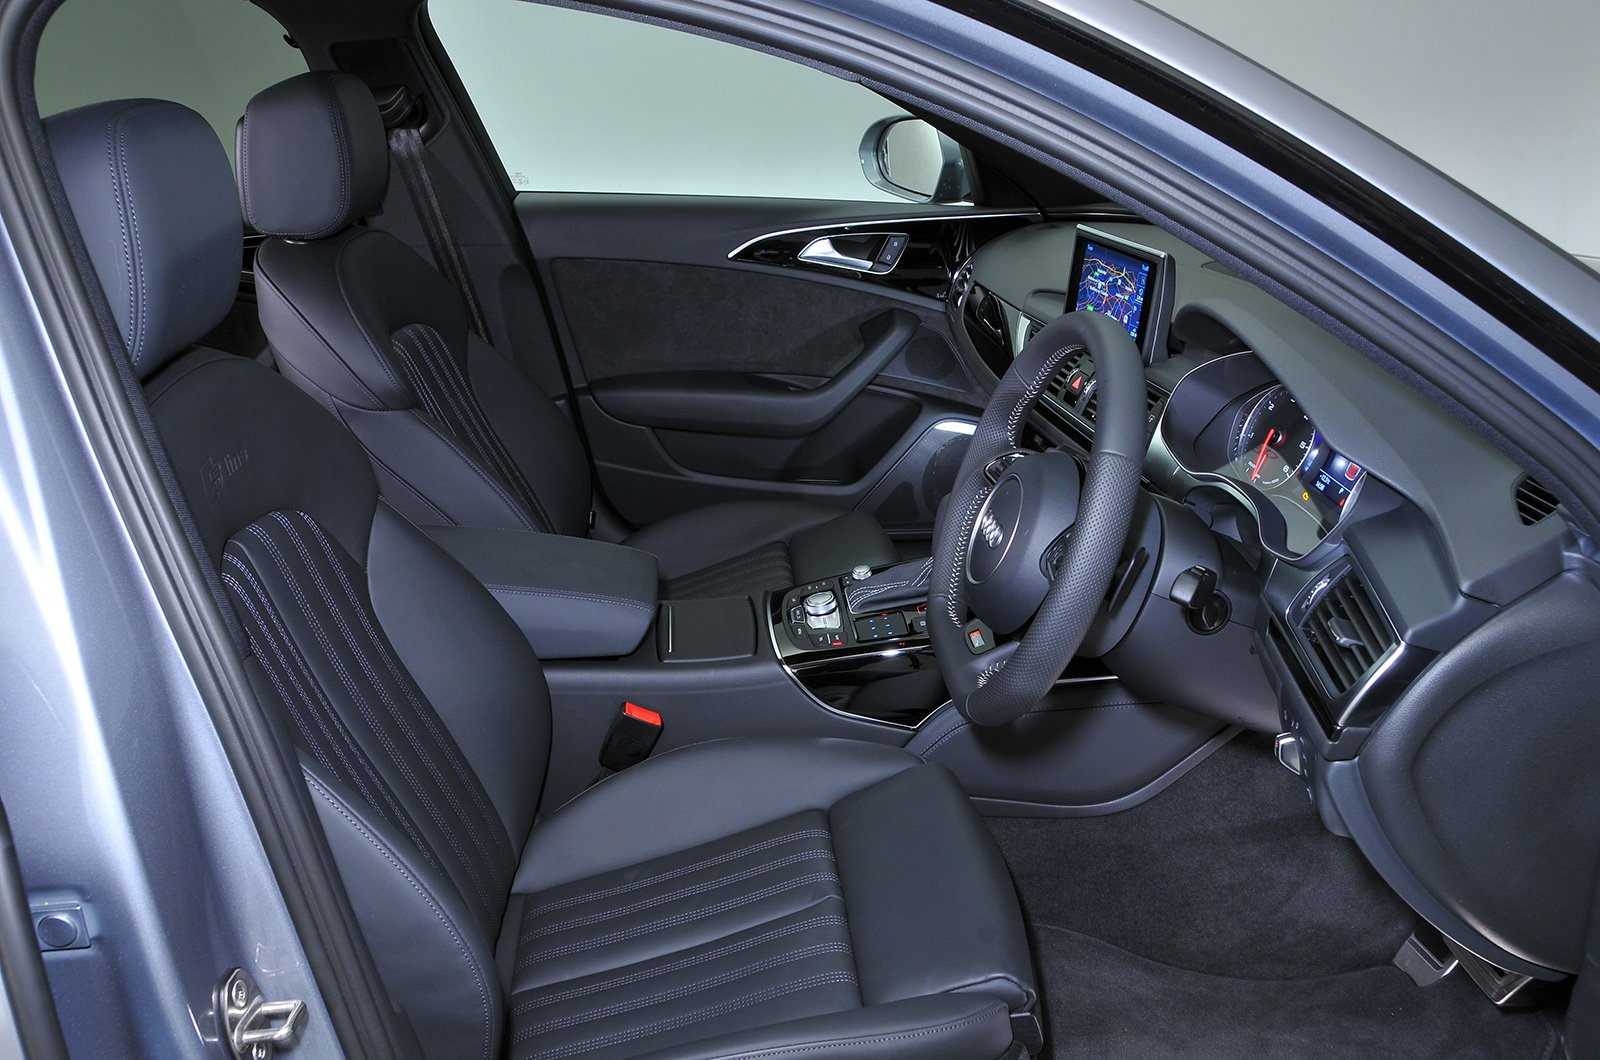 Audi A6 2011-2018 front seats